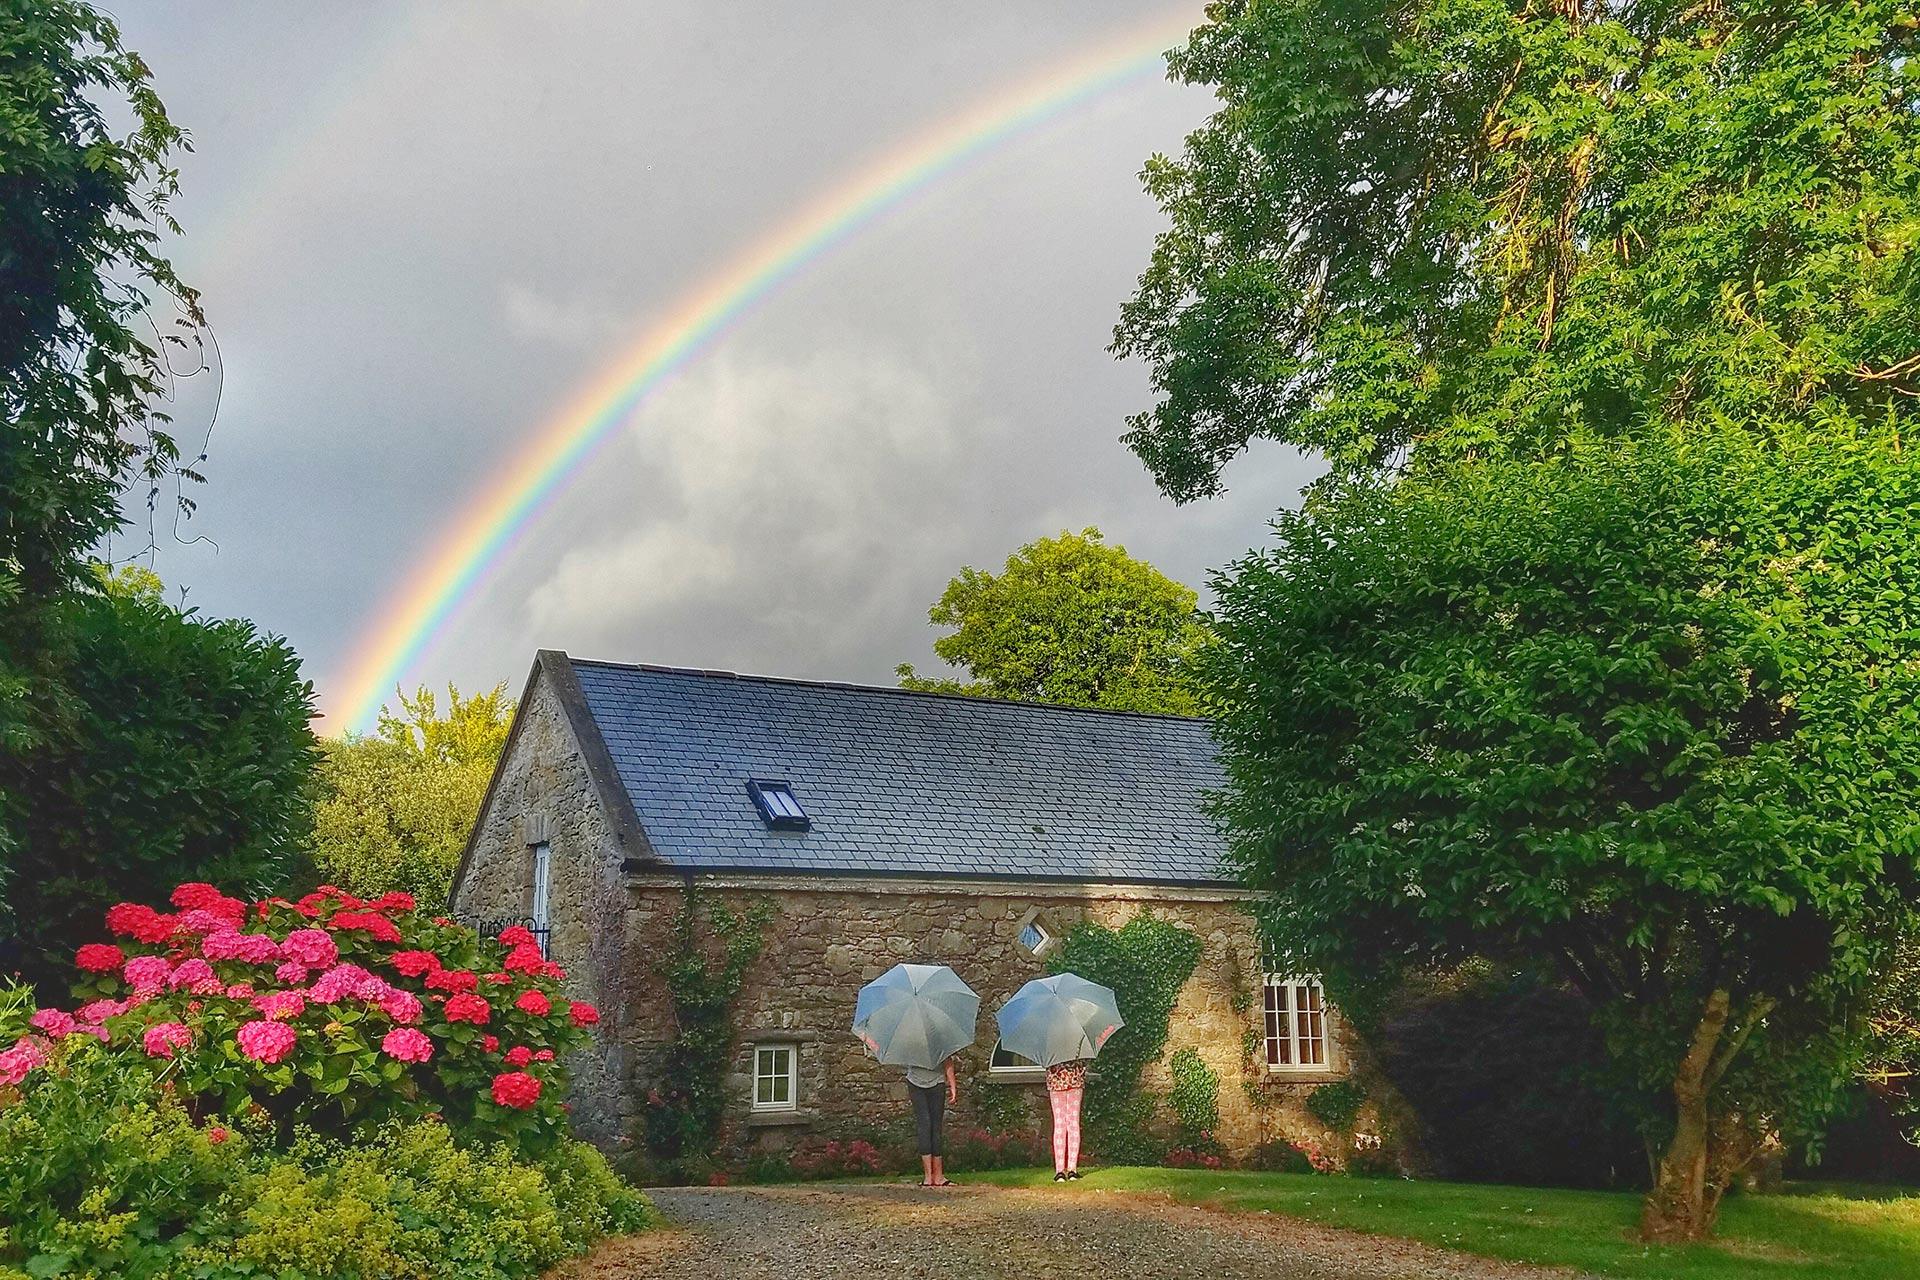 County Clare, Ireland; Photo Courtesy of Jeff Bogle/Family Vacation Critic